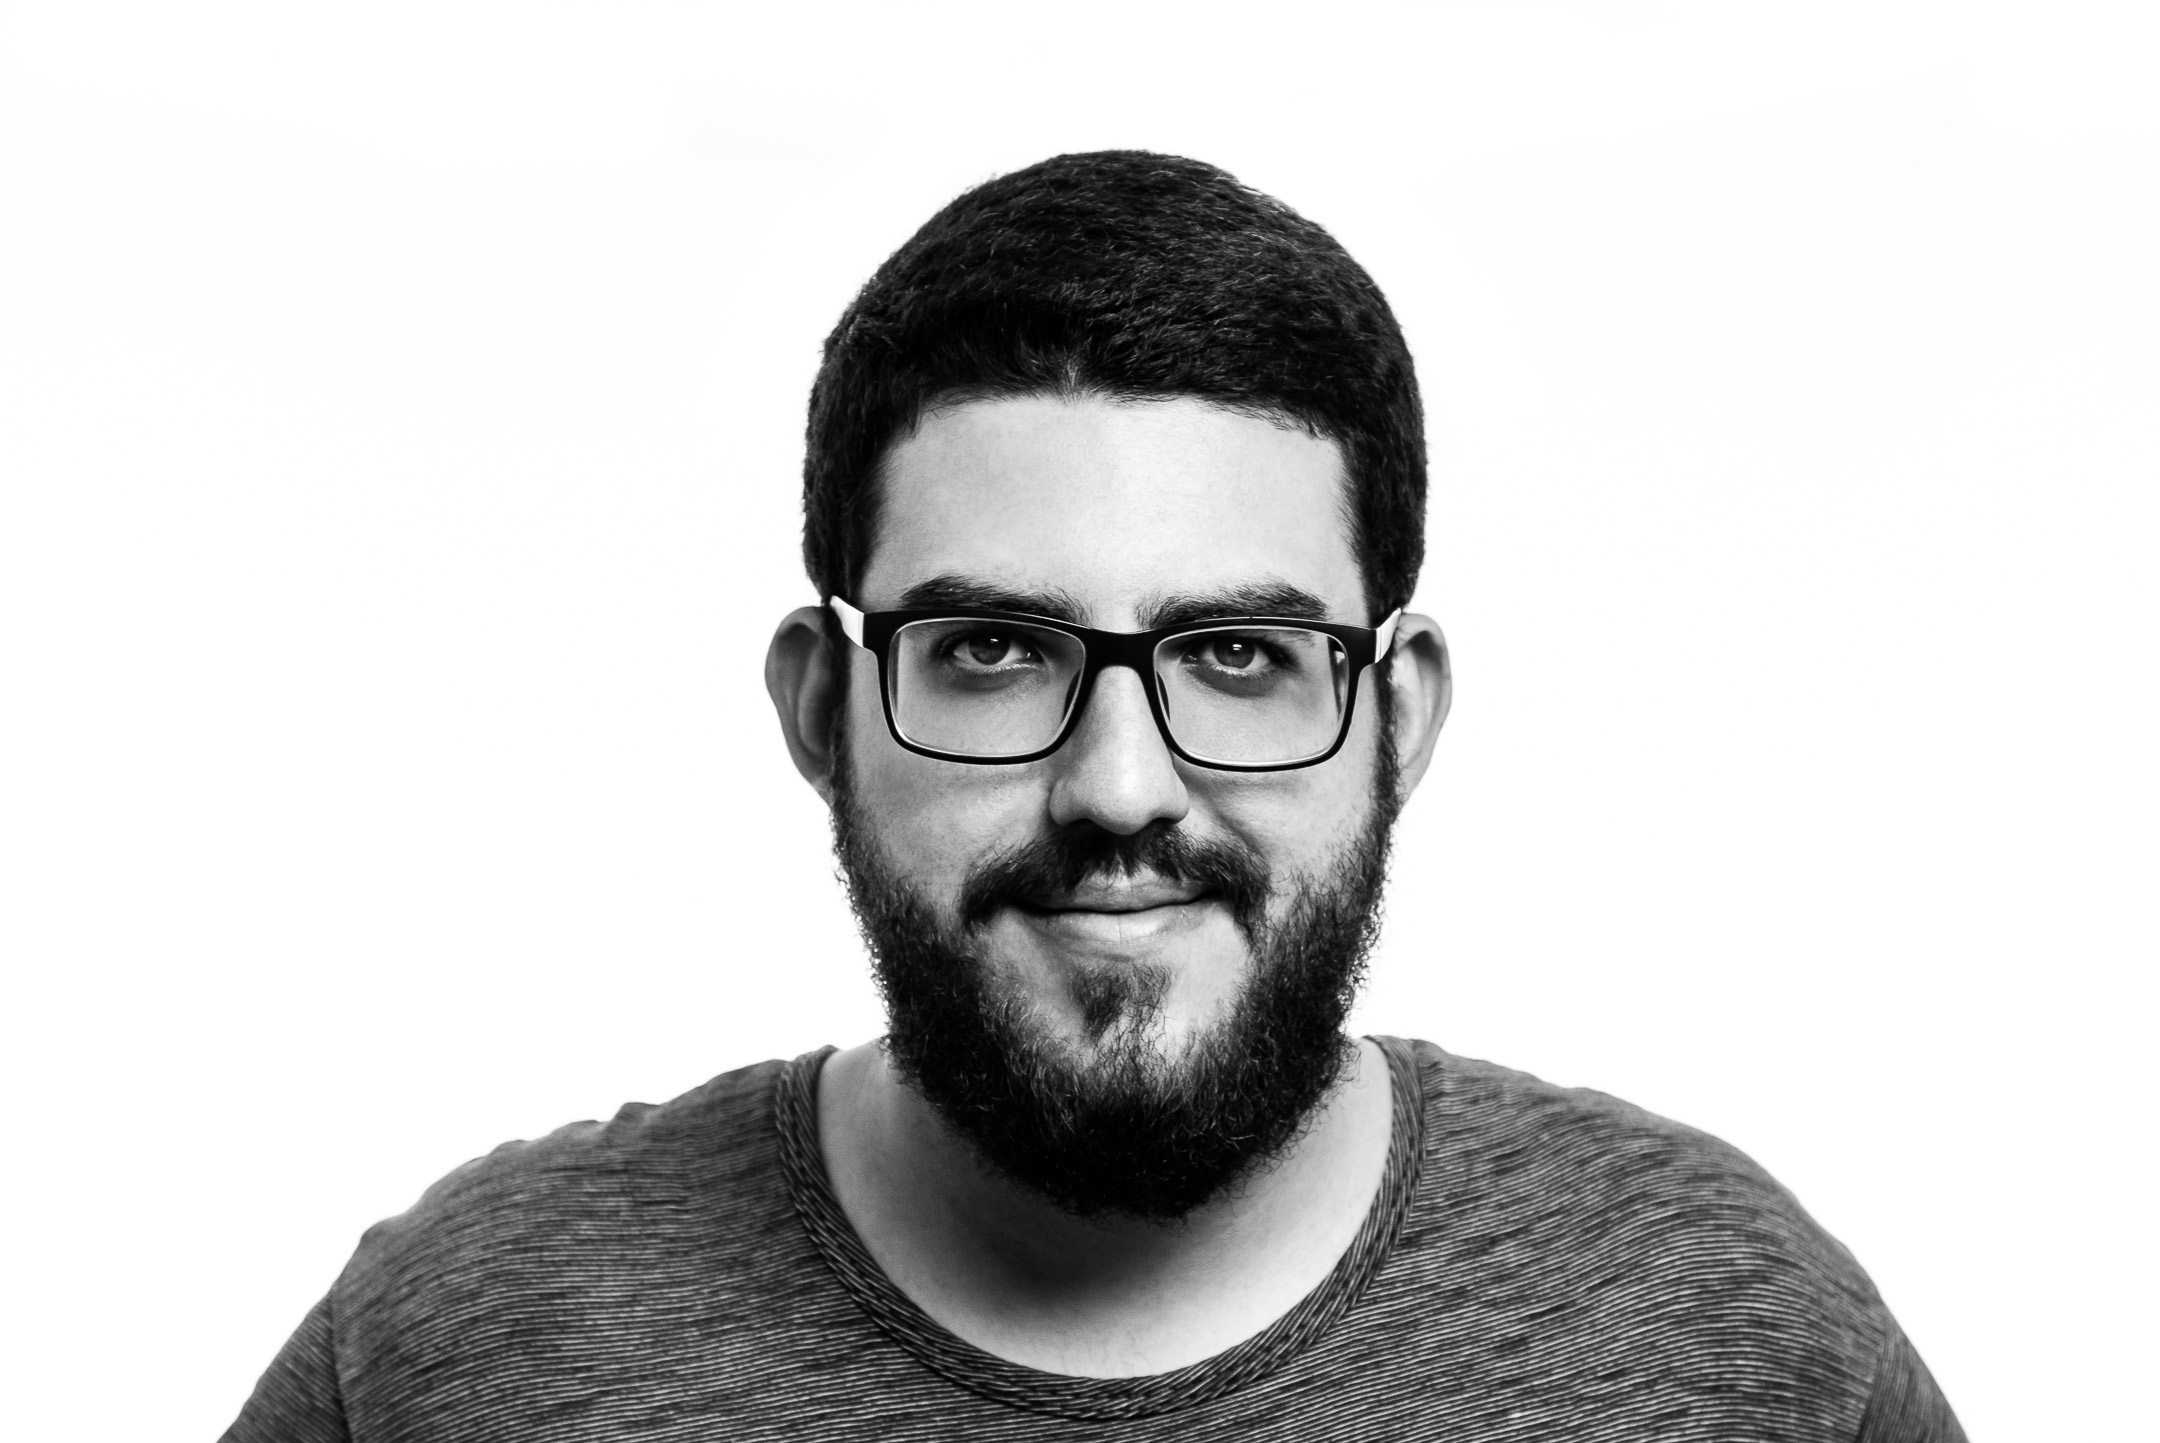 Lucas Pavani